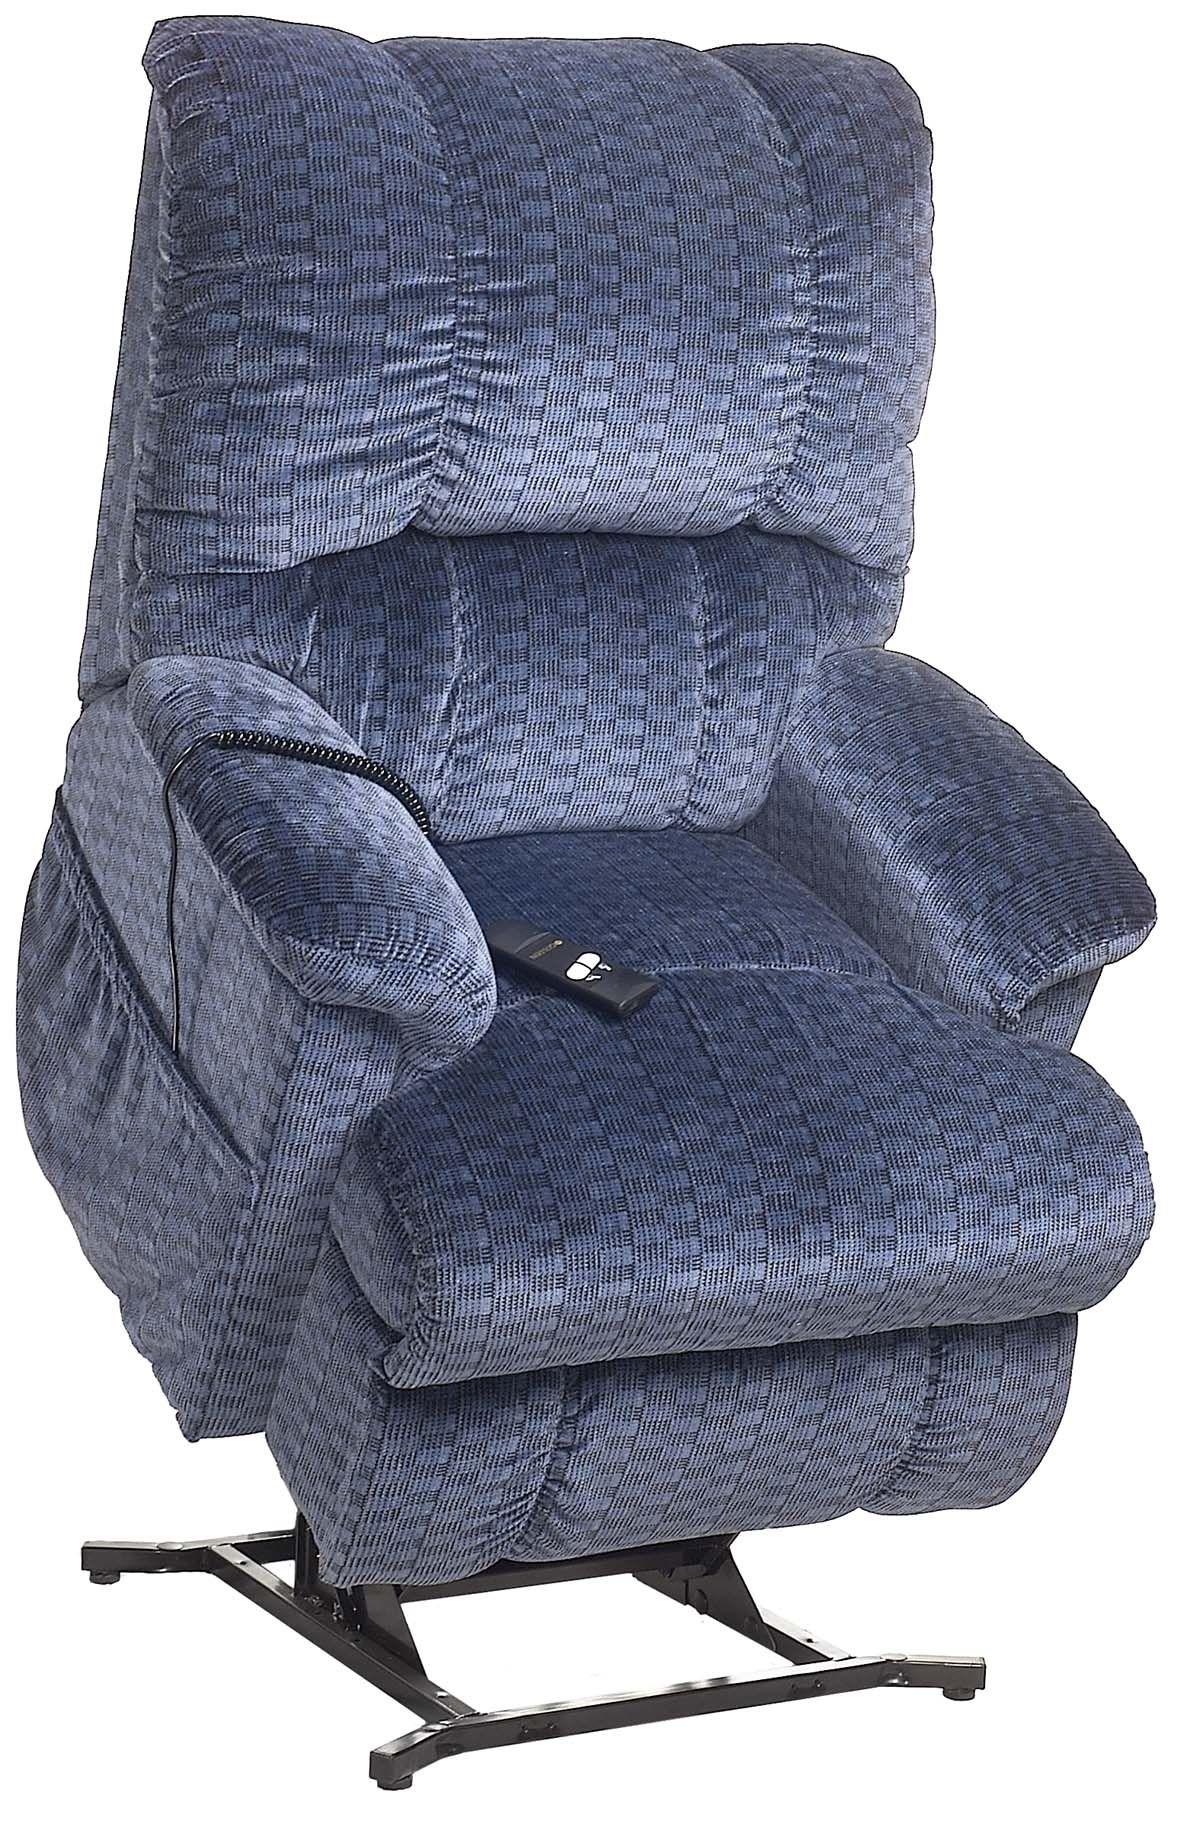 Luxuy Lift Recliner Chair  sc 1 st  Pinterest & Luxuy Lift Recliner Chair | HANDICAPPED AND ACCESSIBLE IDEAS ... islam-shia.org